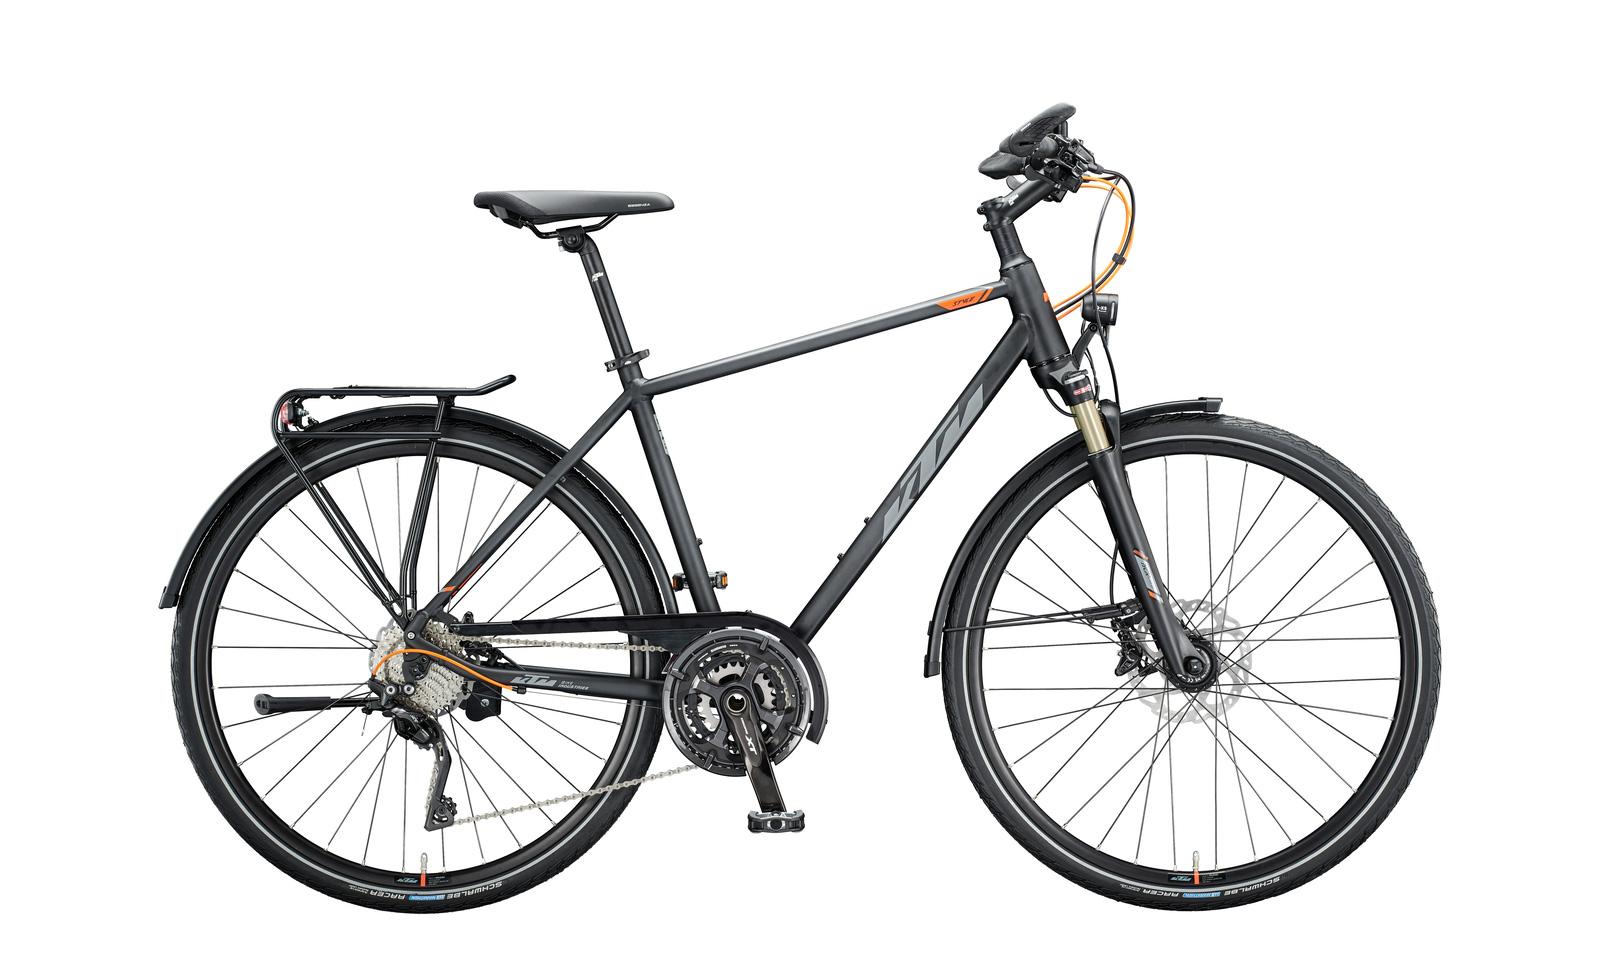 Biciclete KTM Trekking Onroad LIFE STYLE 3x10 Shimano Deore XT